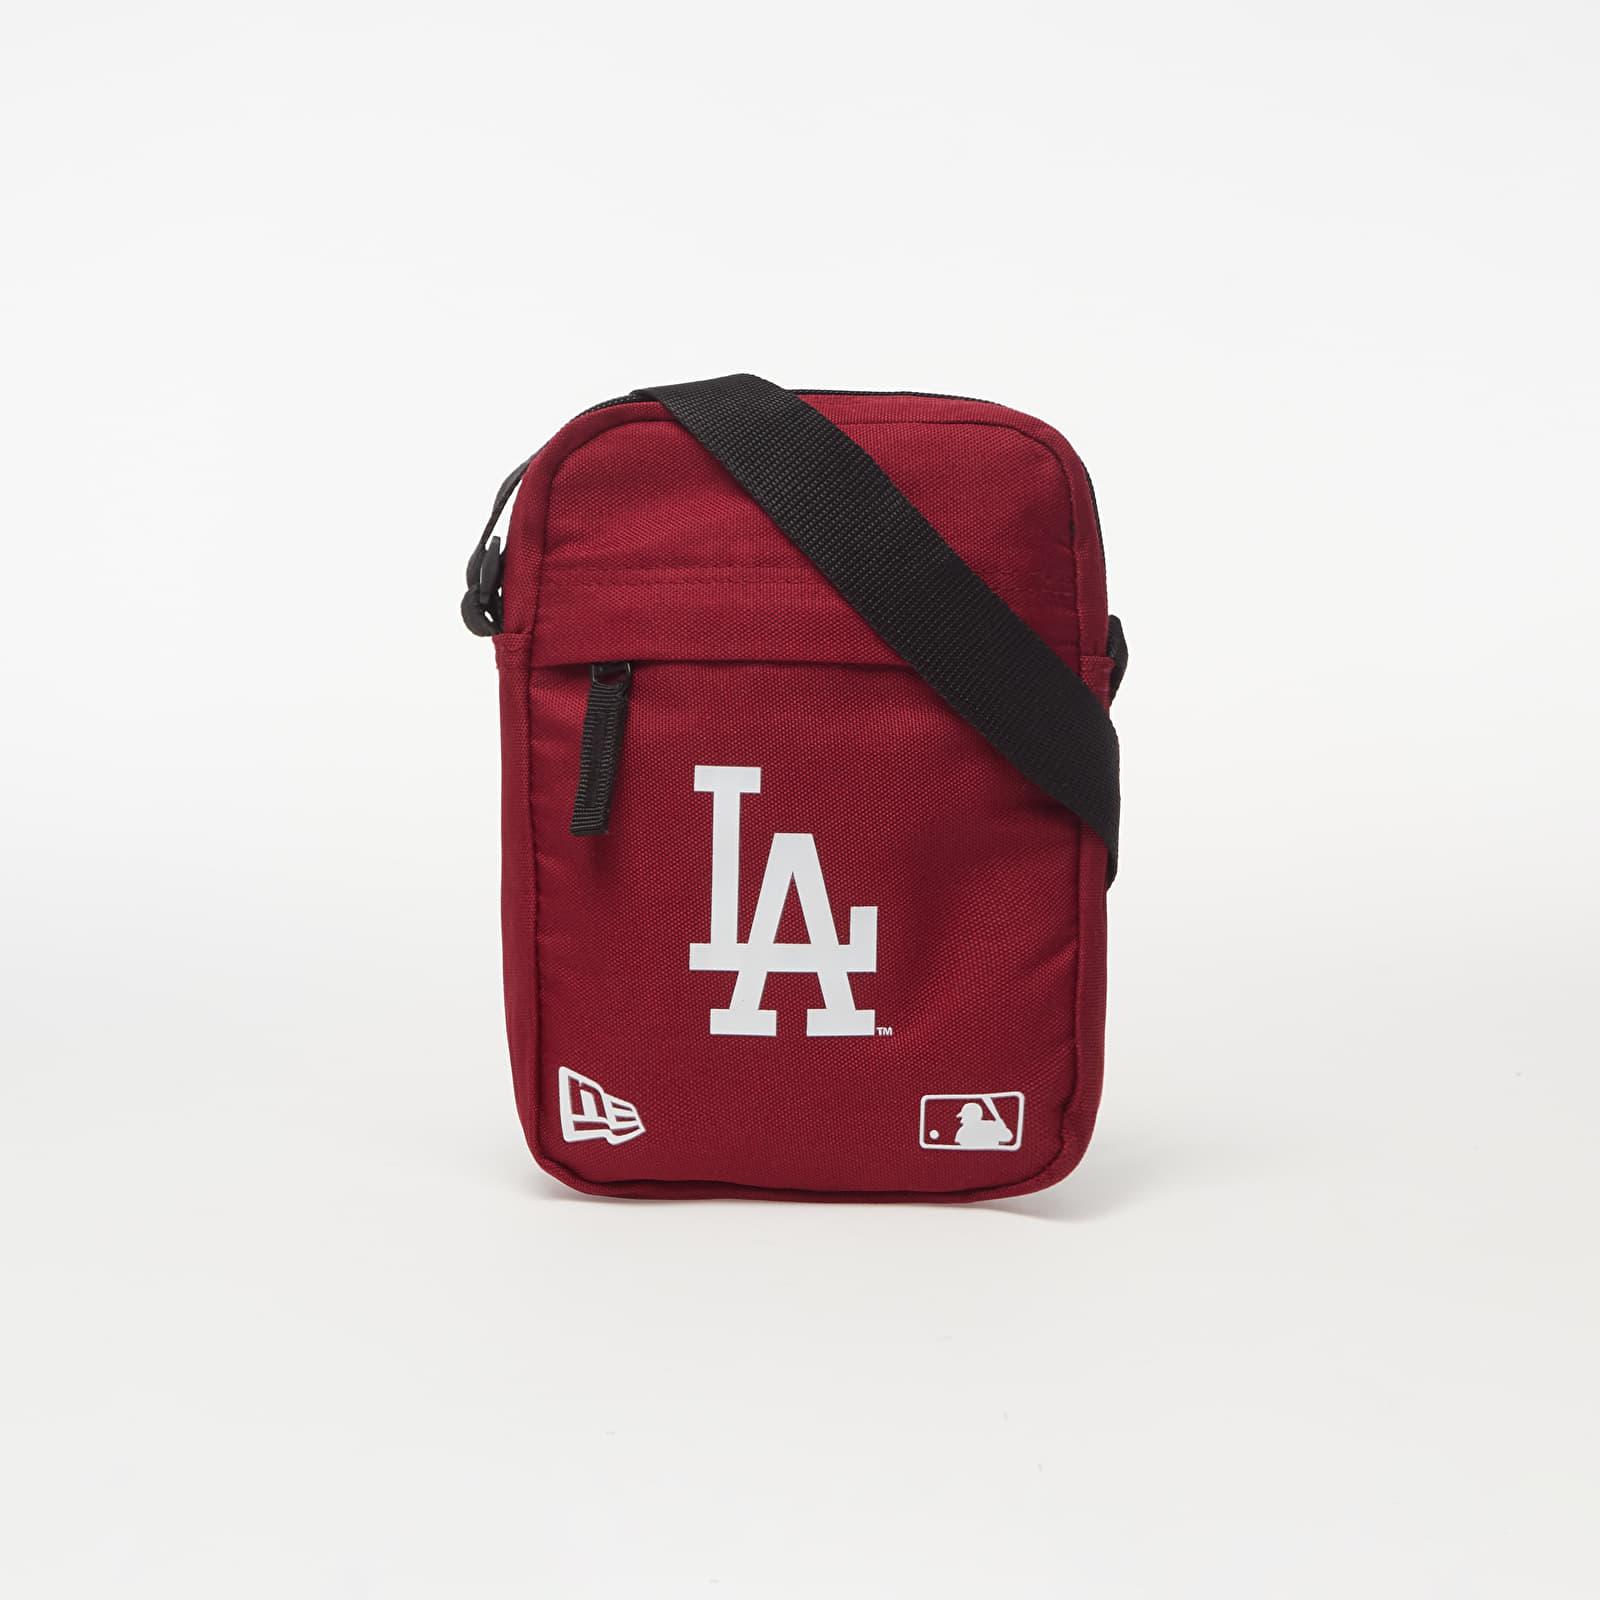 Taschen New Era MLB Los Angeles Dodgers Side Bag Maroon